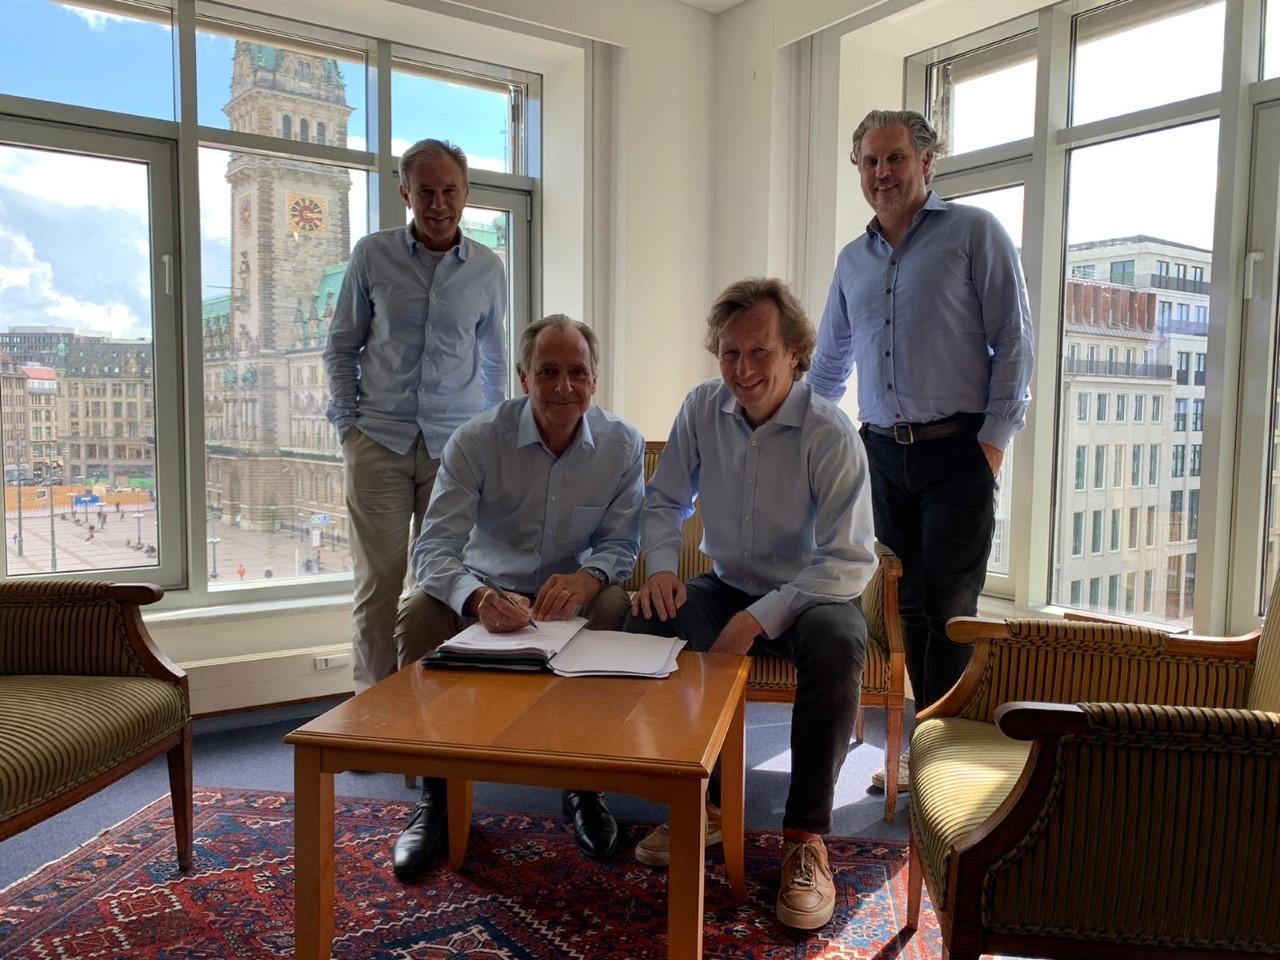 Dunfermline: DAFC Fussball GmbH to take overall control